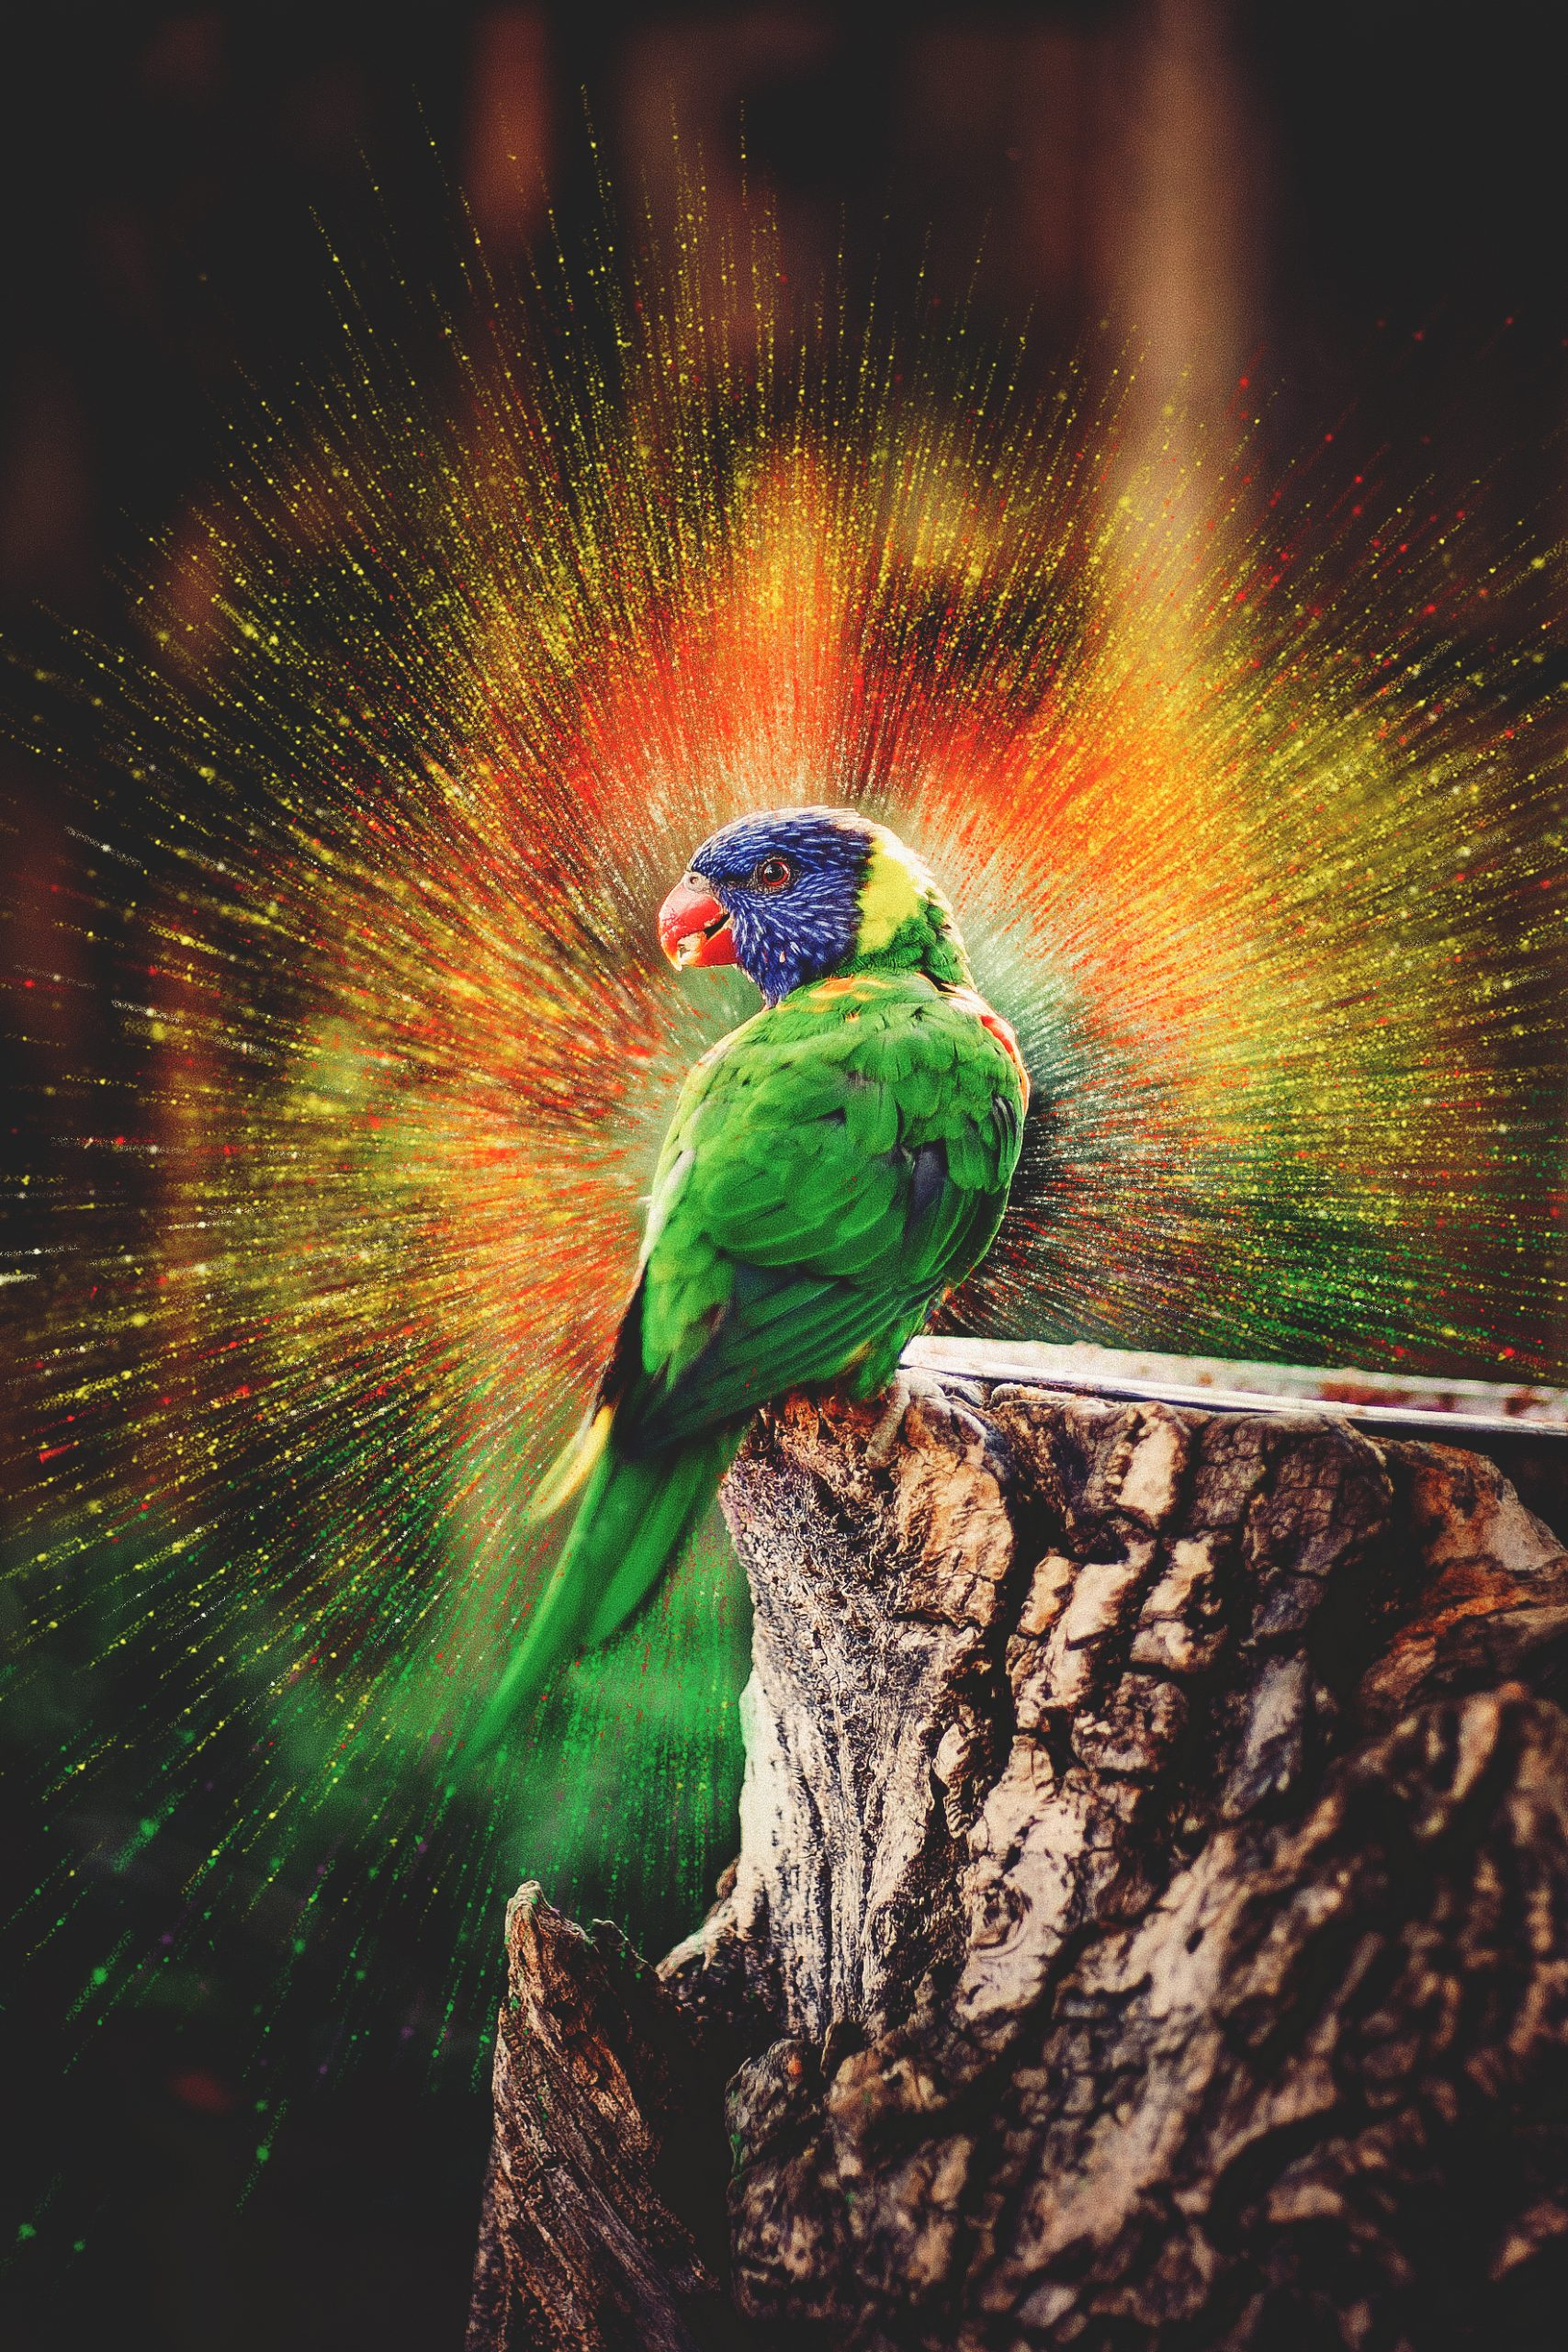 Parrot Bird Color Explosion